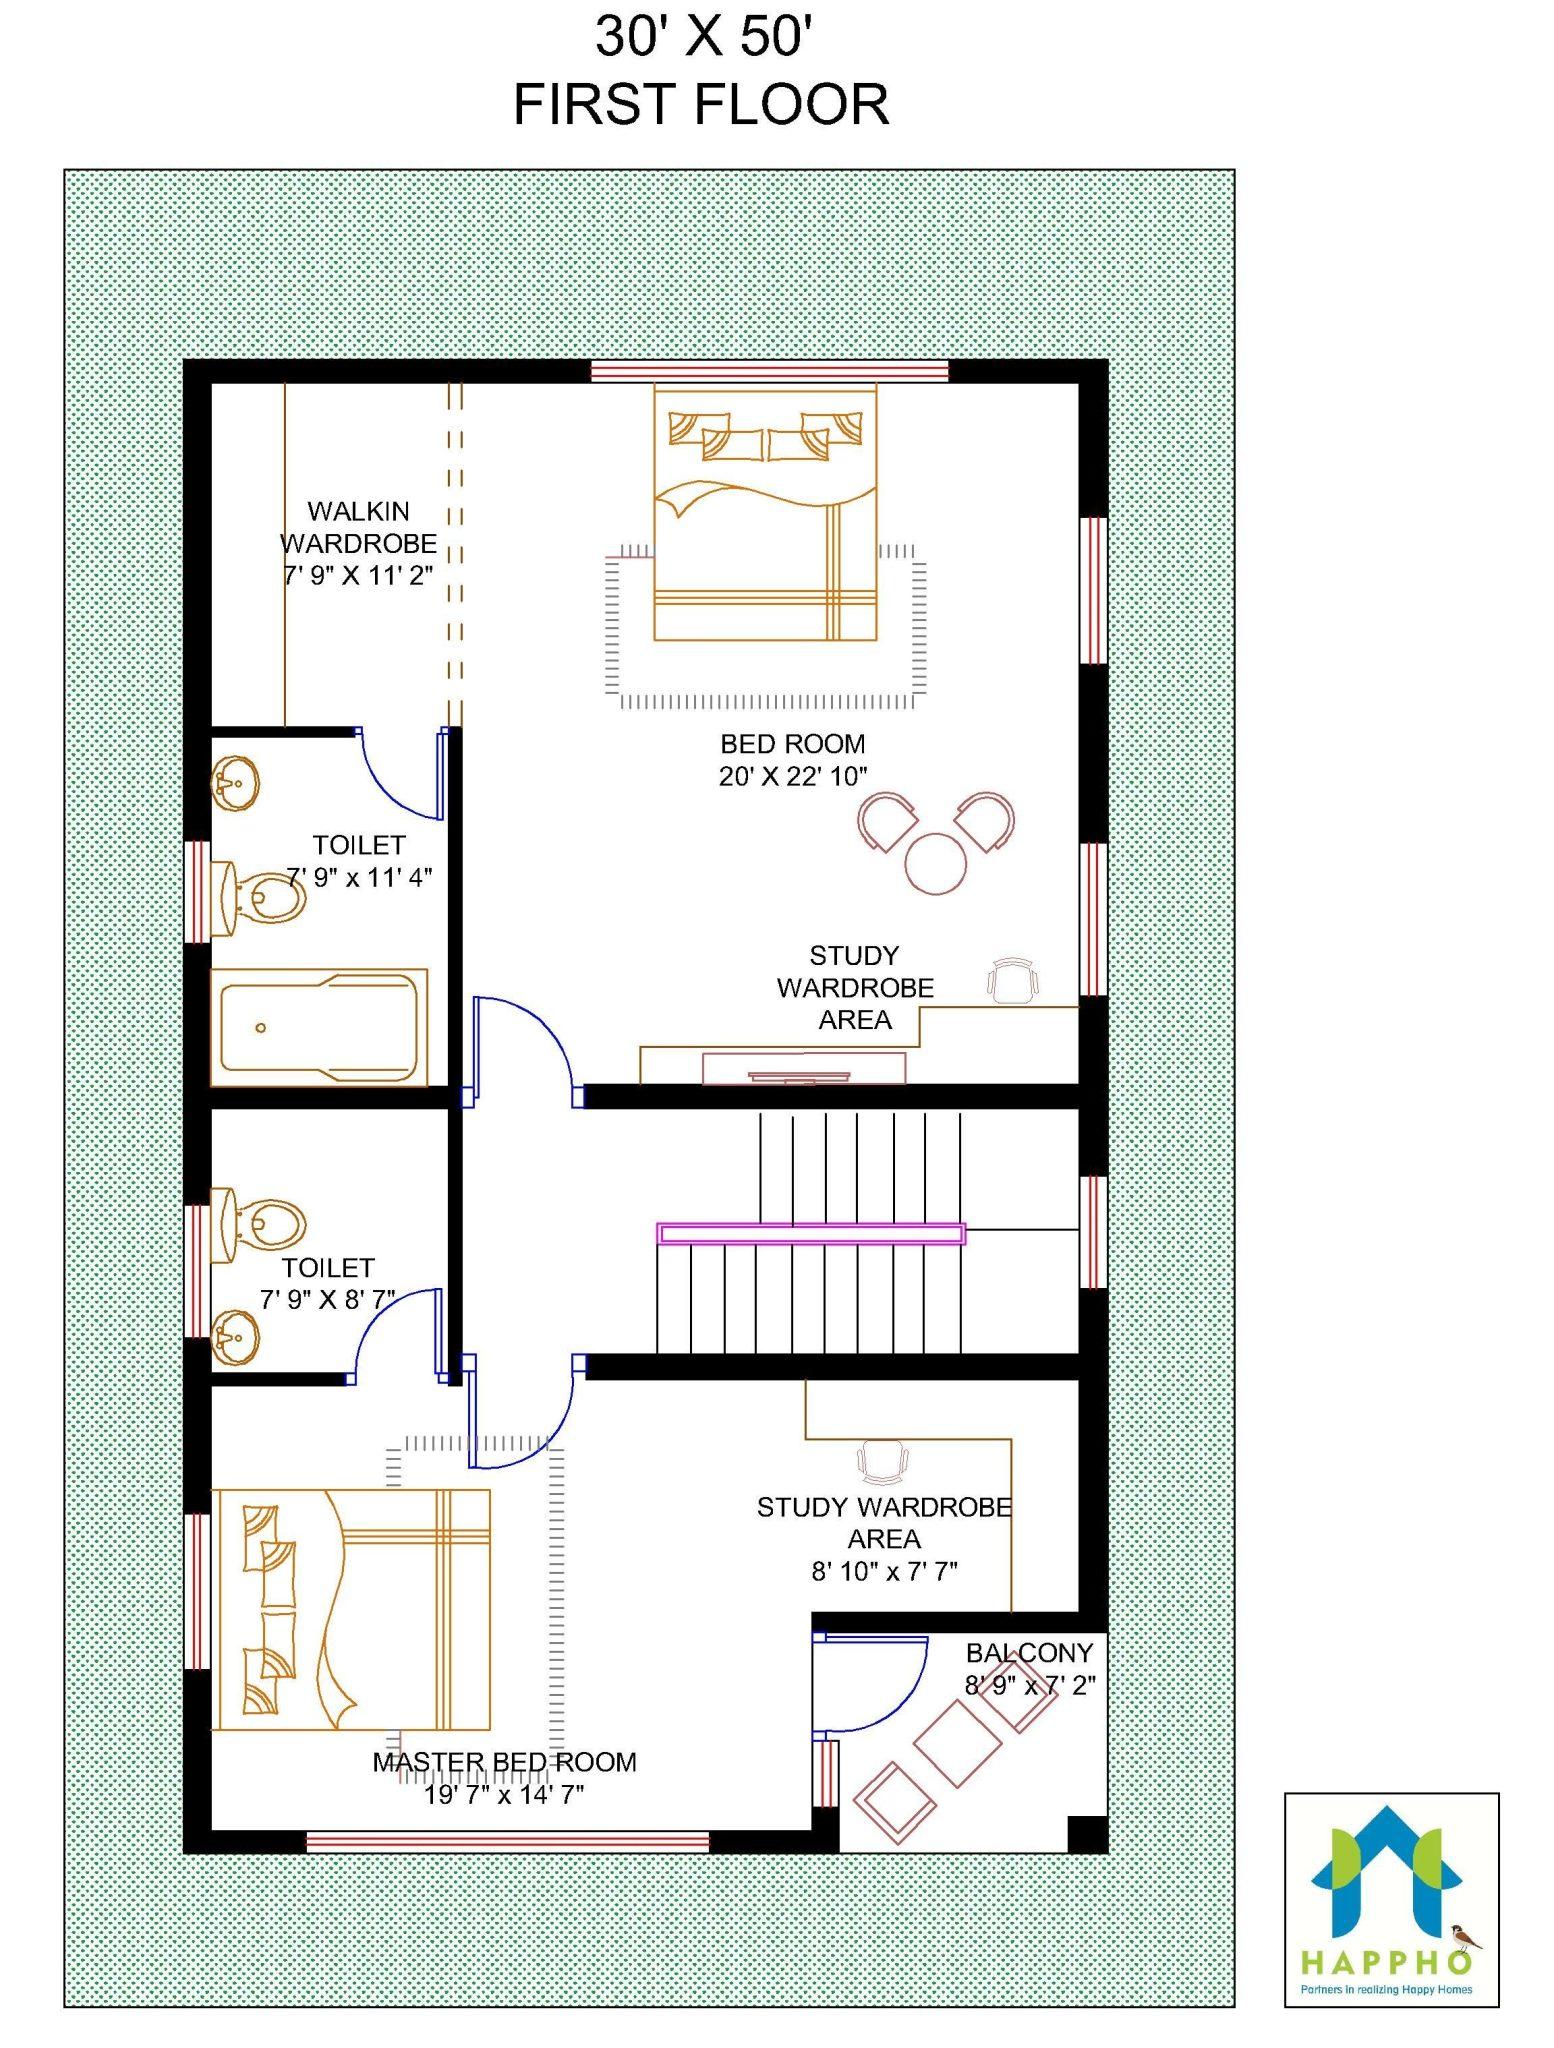 First Floor Plan 1500 Square Feet 50feet X 30 166 67